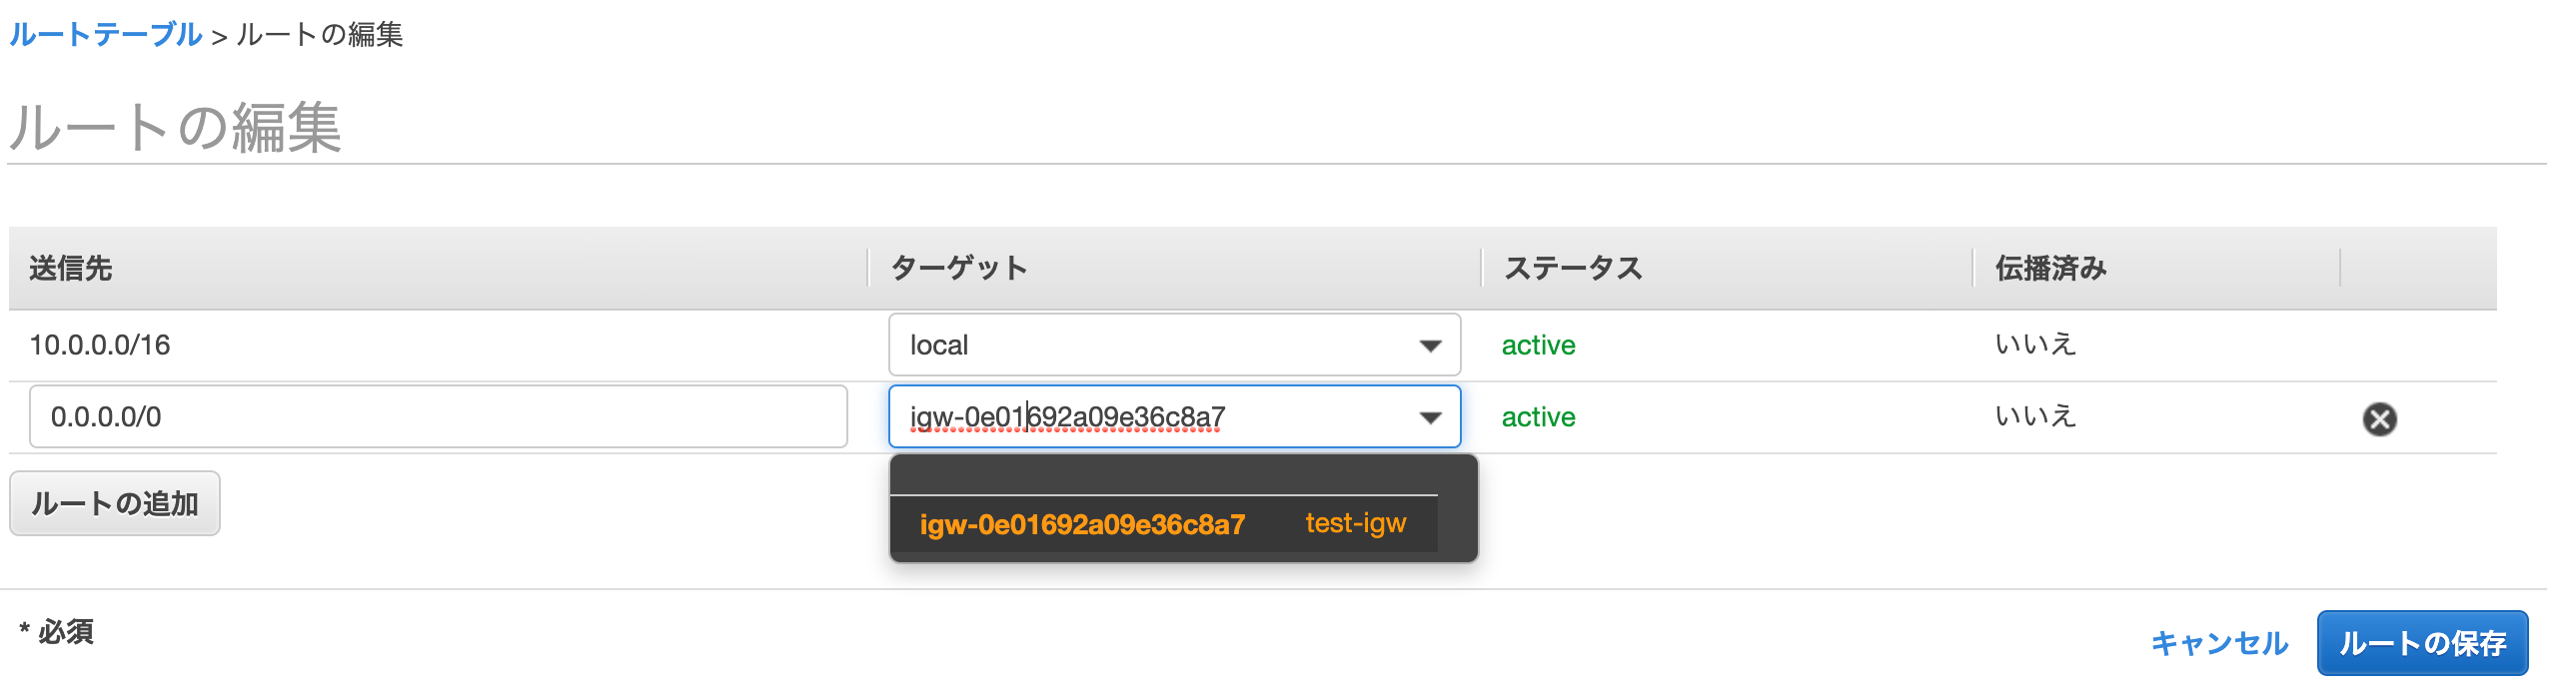 vpc_routingtable_setting_public.png